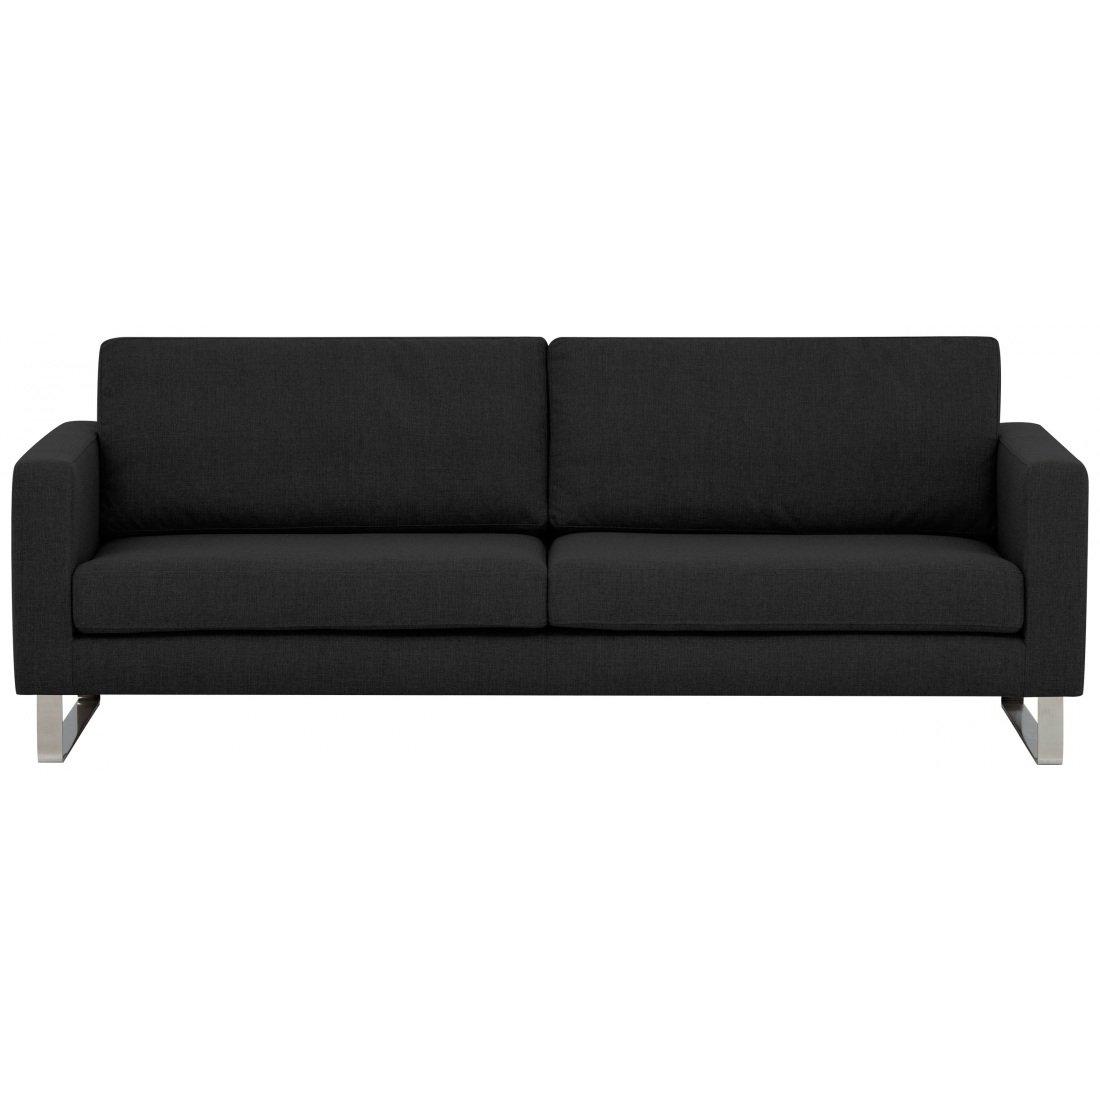 3-Sitzer Sofa Dunkelgrau Designer Couch Sofa online bestellen